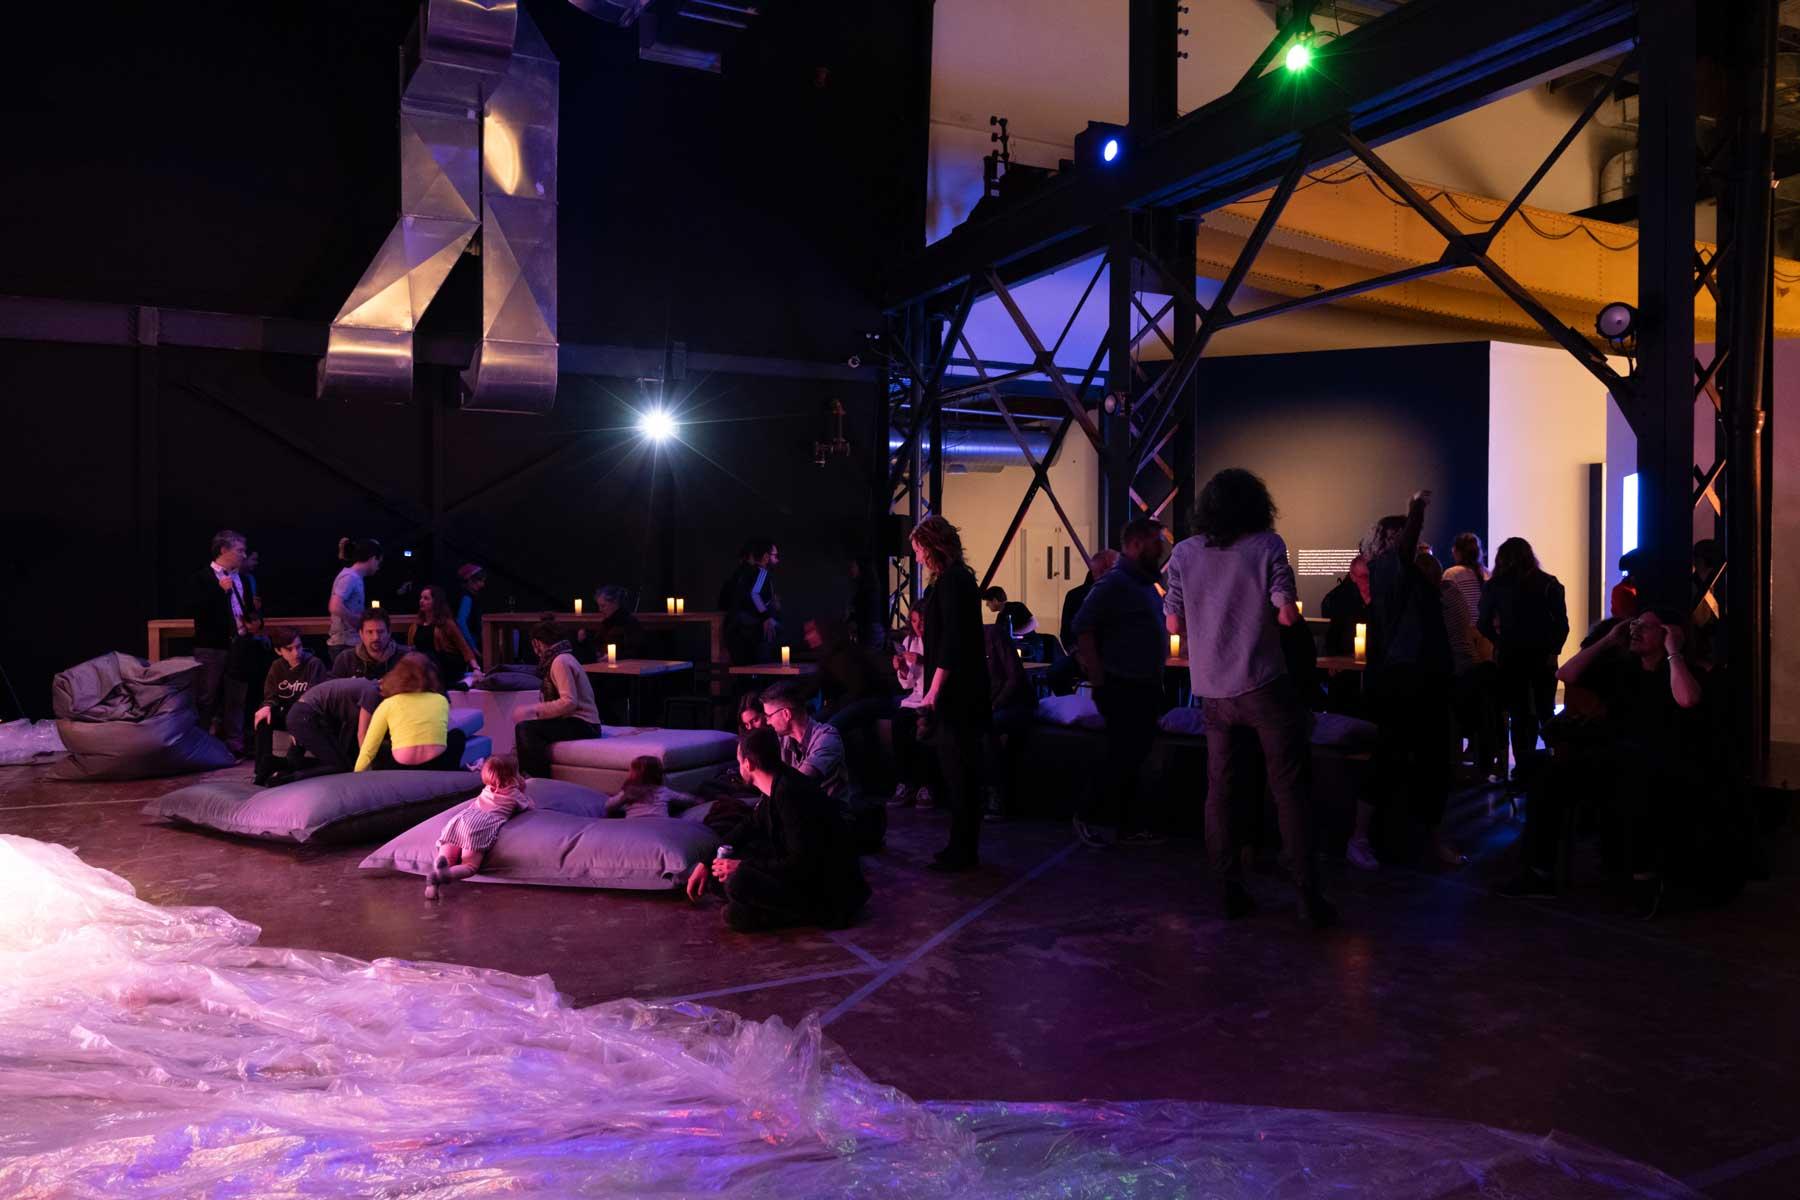 mardi-culturel-td-danse-danse-kyra-jean-green-trip-the-light-fantastic-18.jpg